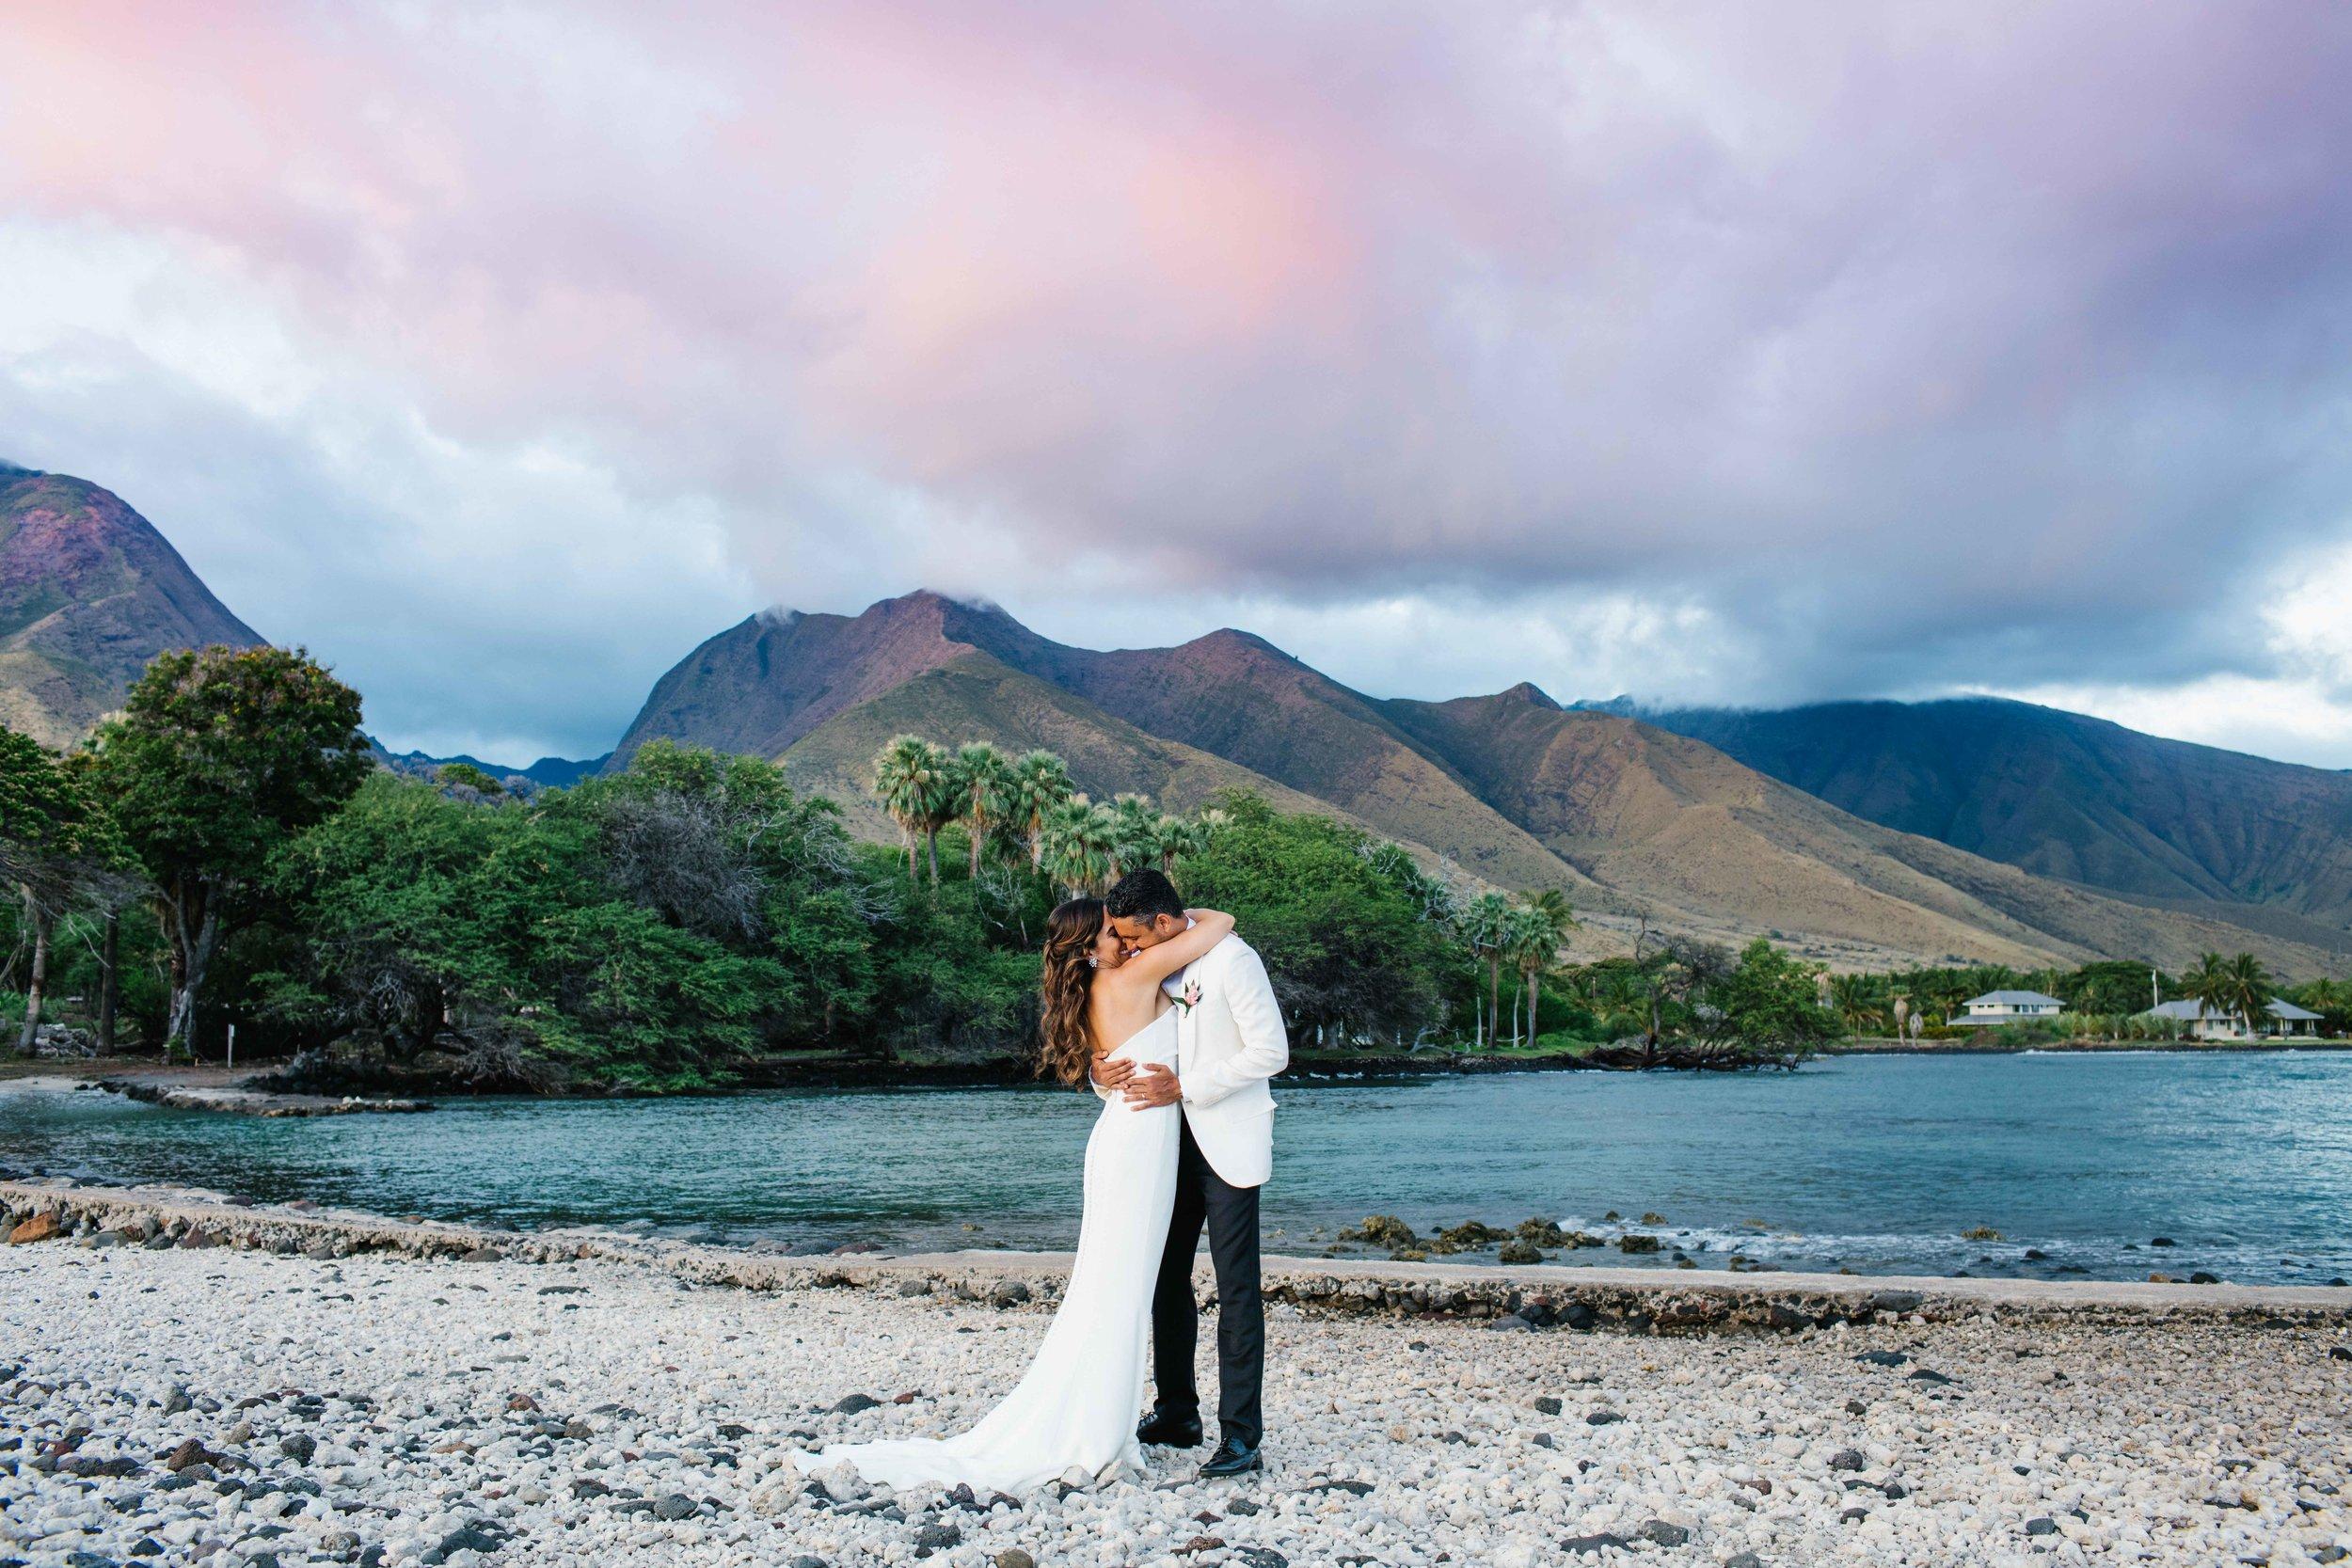 Maui-Wedding-Photographer-9279.jpg